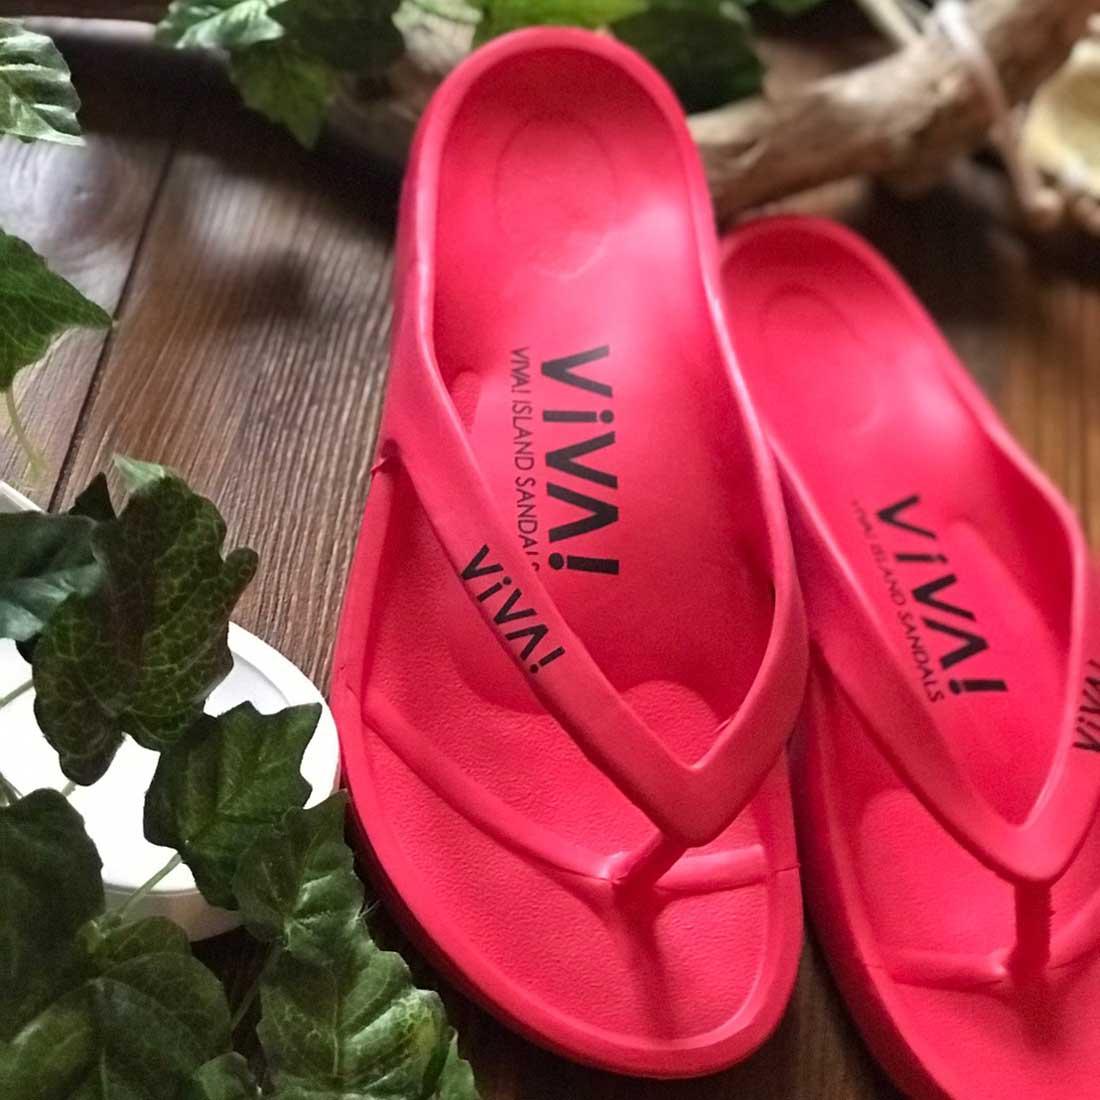 VIVA! ISLAND|ビバアイランド FLIP FLOP ビーチサンダル(レッド|V-810105_RED)